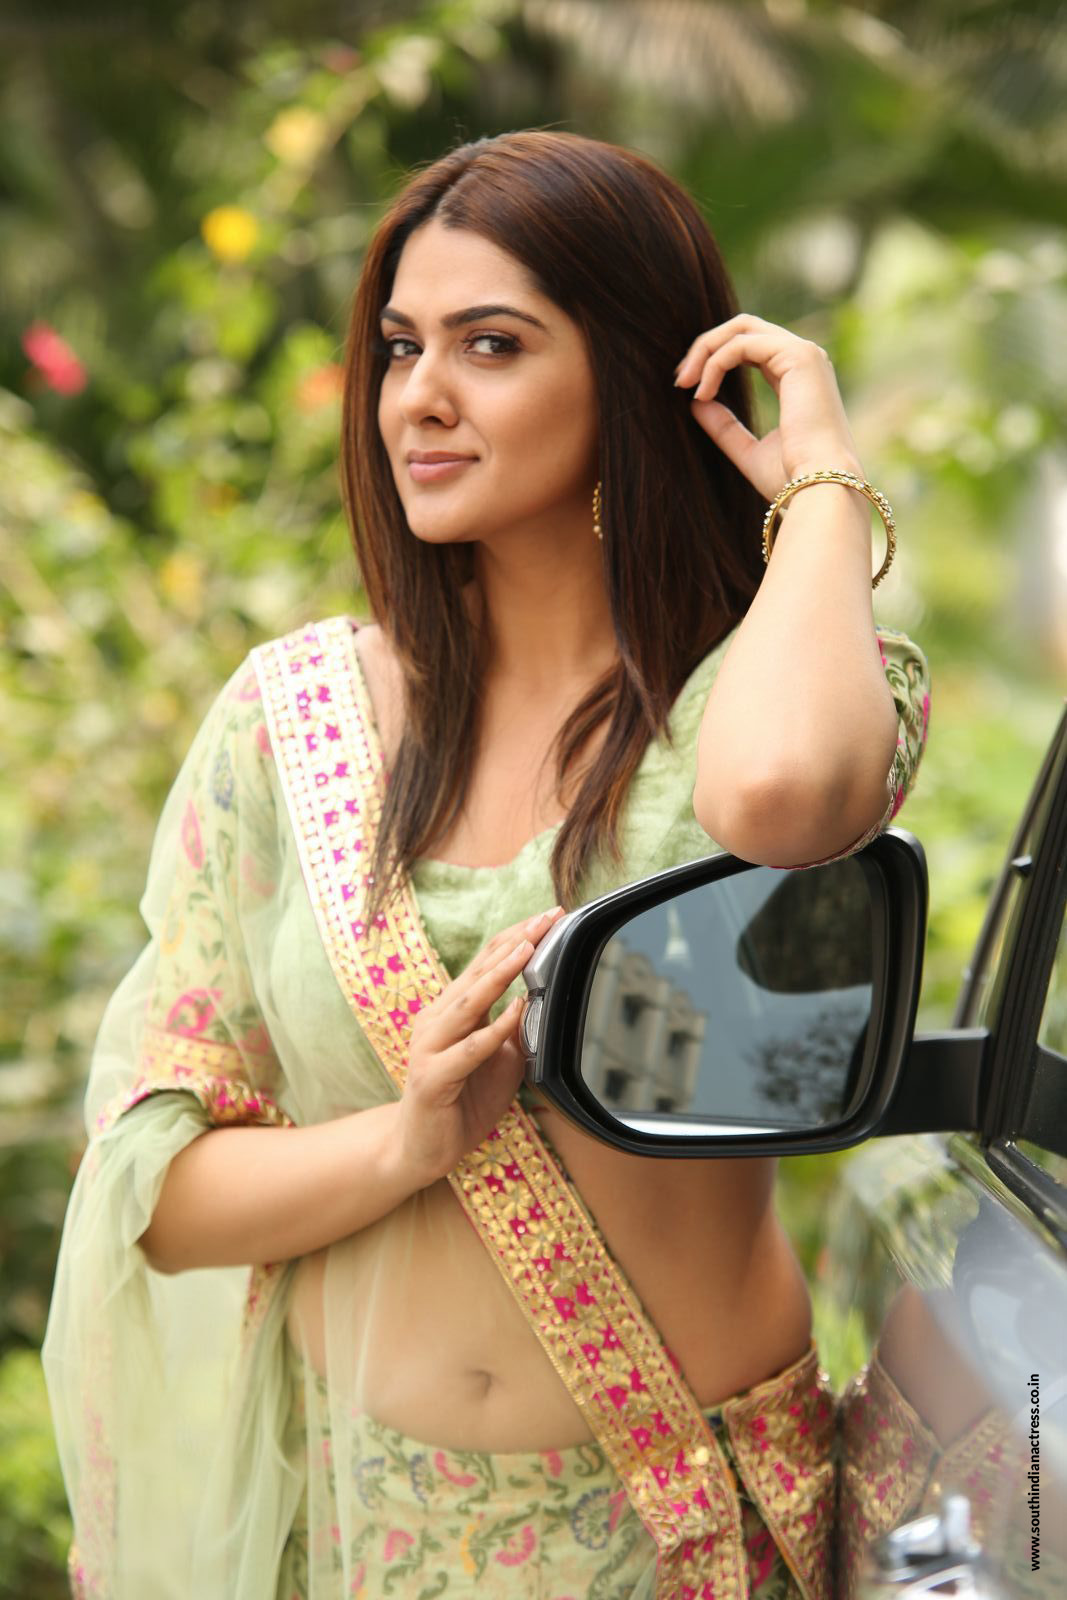 Sakshi Chaudhary in Choli Transparent half saree at Oollo Pelliki Kukkala Hadavidi Movie Audio Launch